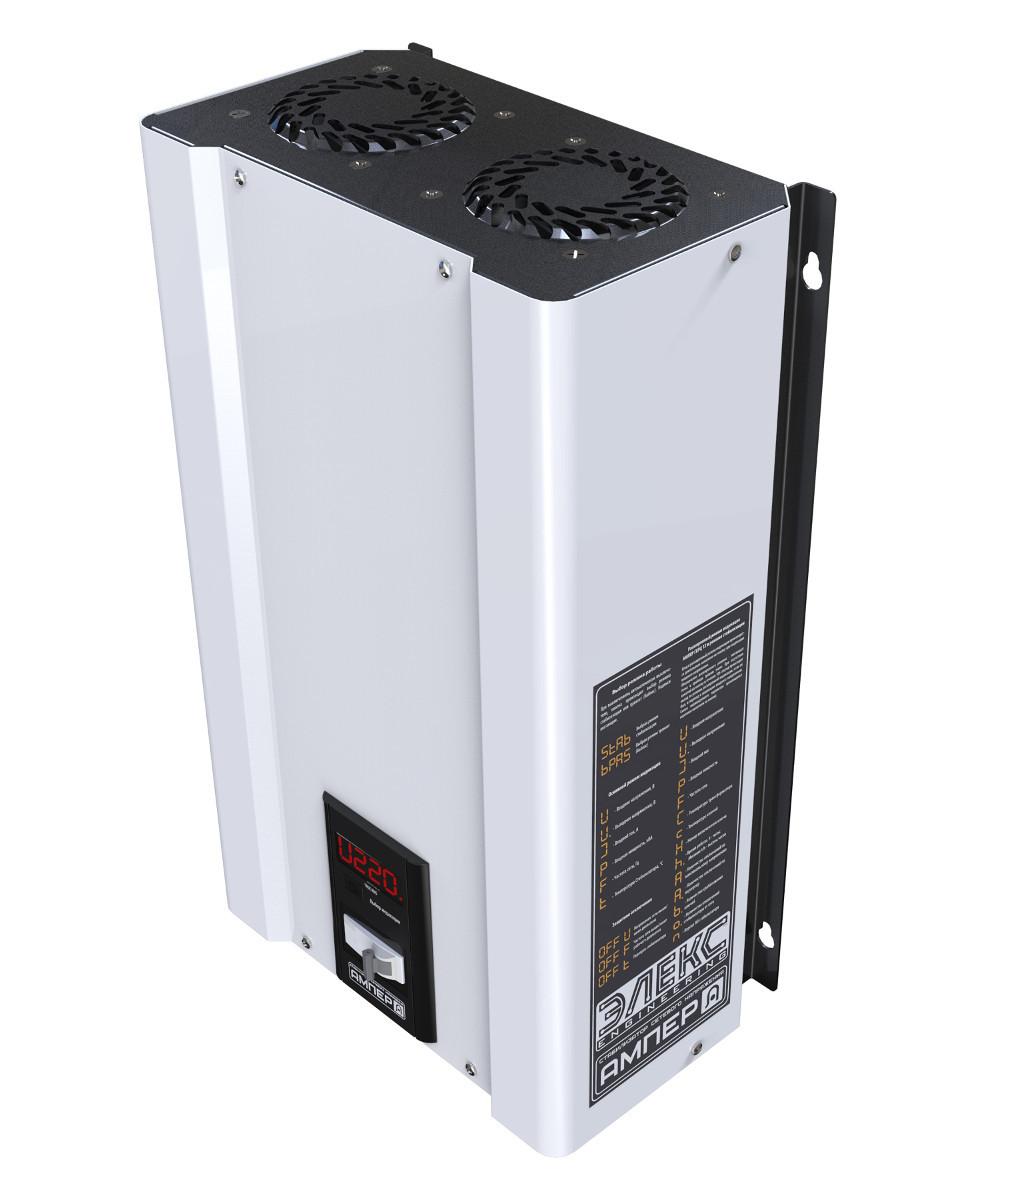 Стабилизатор напряжения Элекс Ампер 12-1/50A 11кВт V2.0